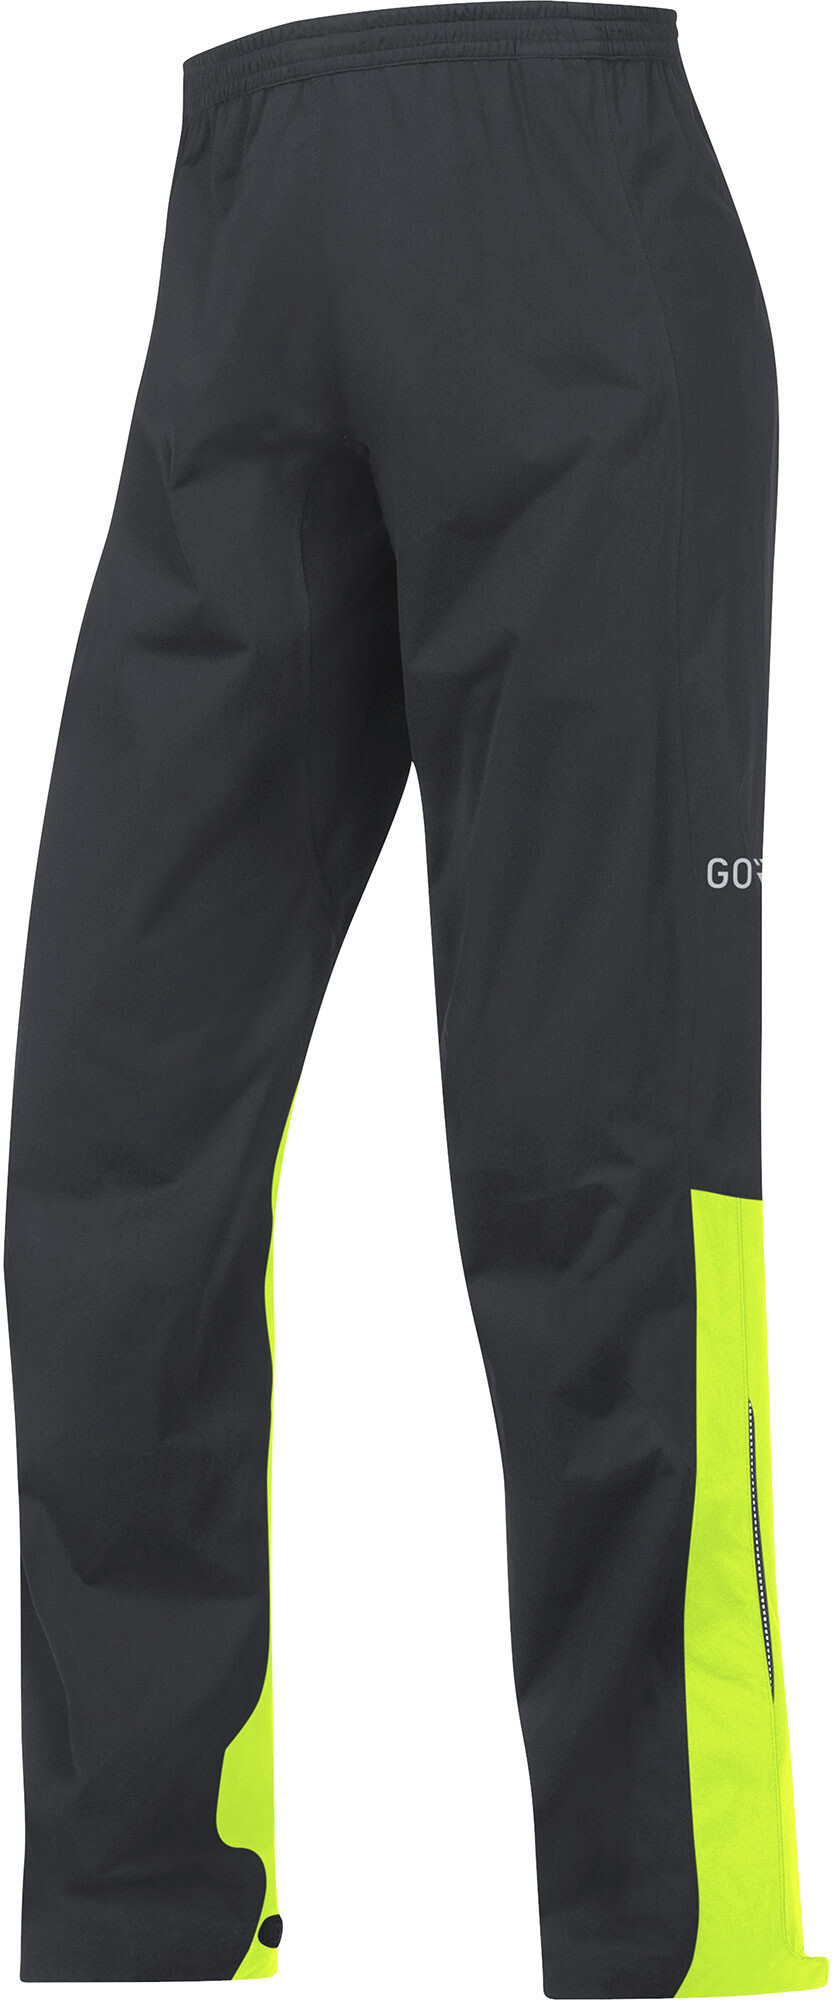 d62b23336 GORE WEAR C3 Gore-Tex Active Sykkelbukse Herre black/neon yellow